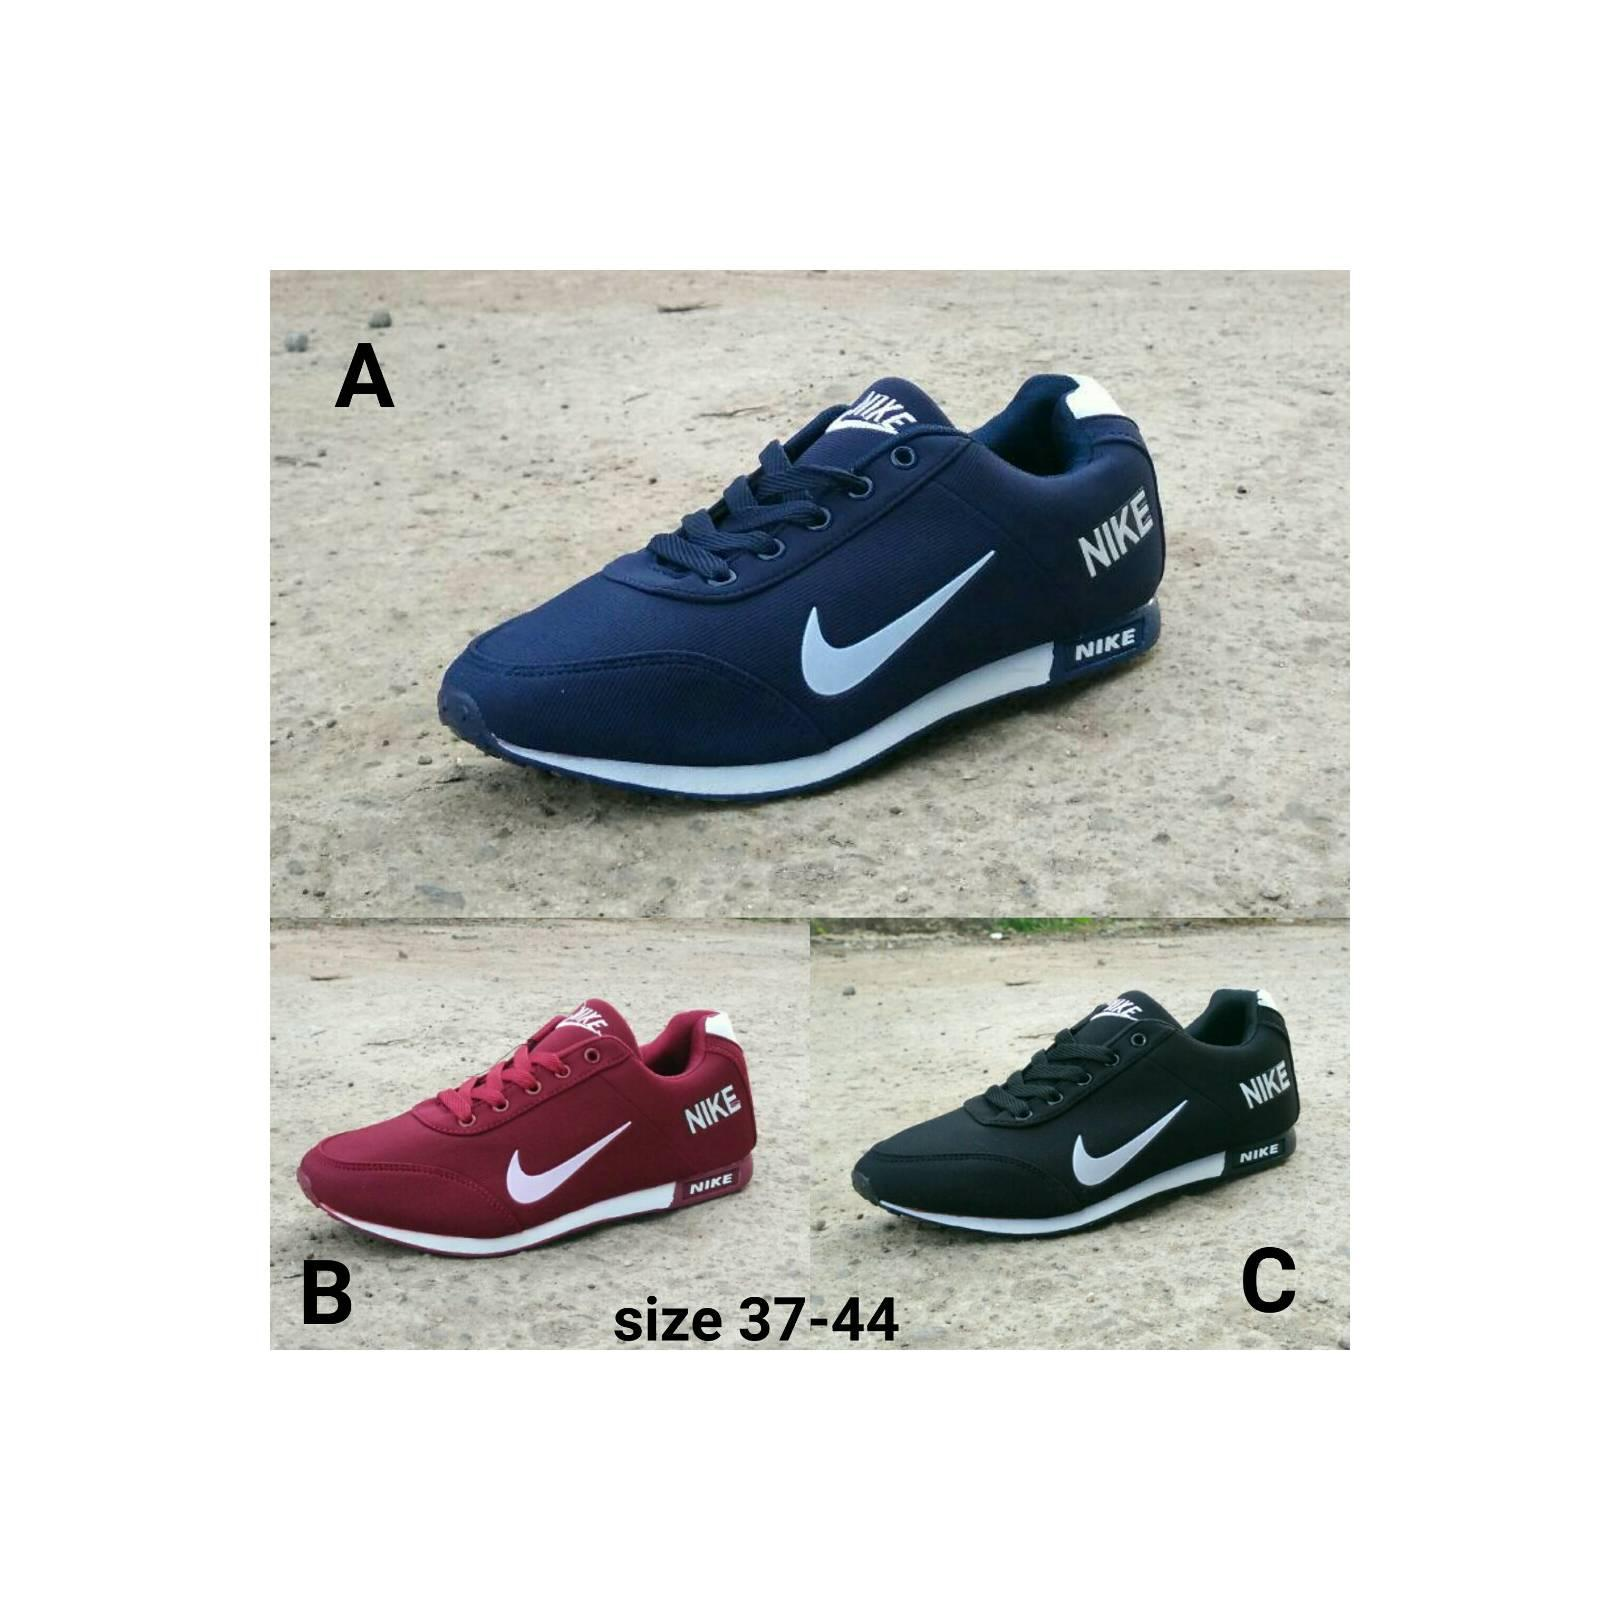 sepatu olahraga nike neo import sepatu couple import high Quality